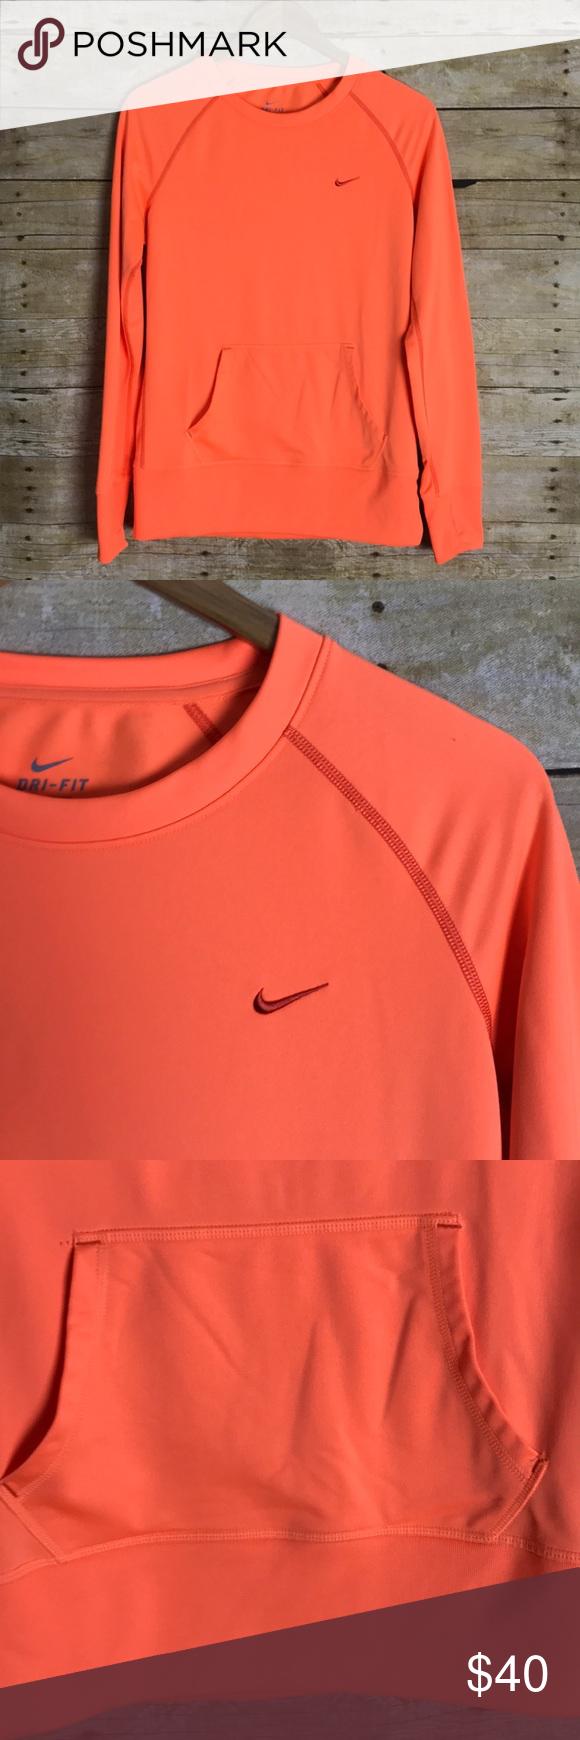 Nike Dri Fit Crew Neck Sweatshirt Sweatshirts Crew Neck Sweatshirt Long Sleeve Tshirt Men [ 1740 x 580 Pixel ]